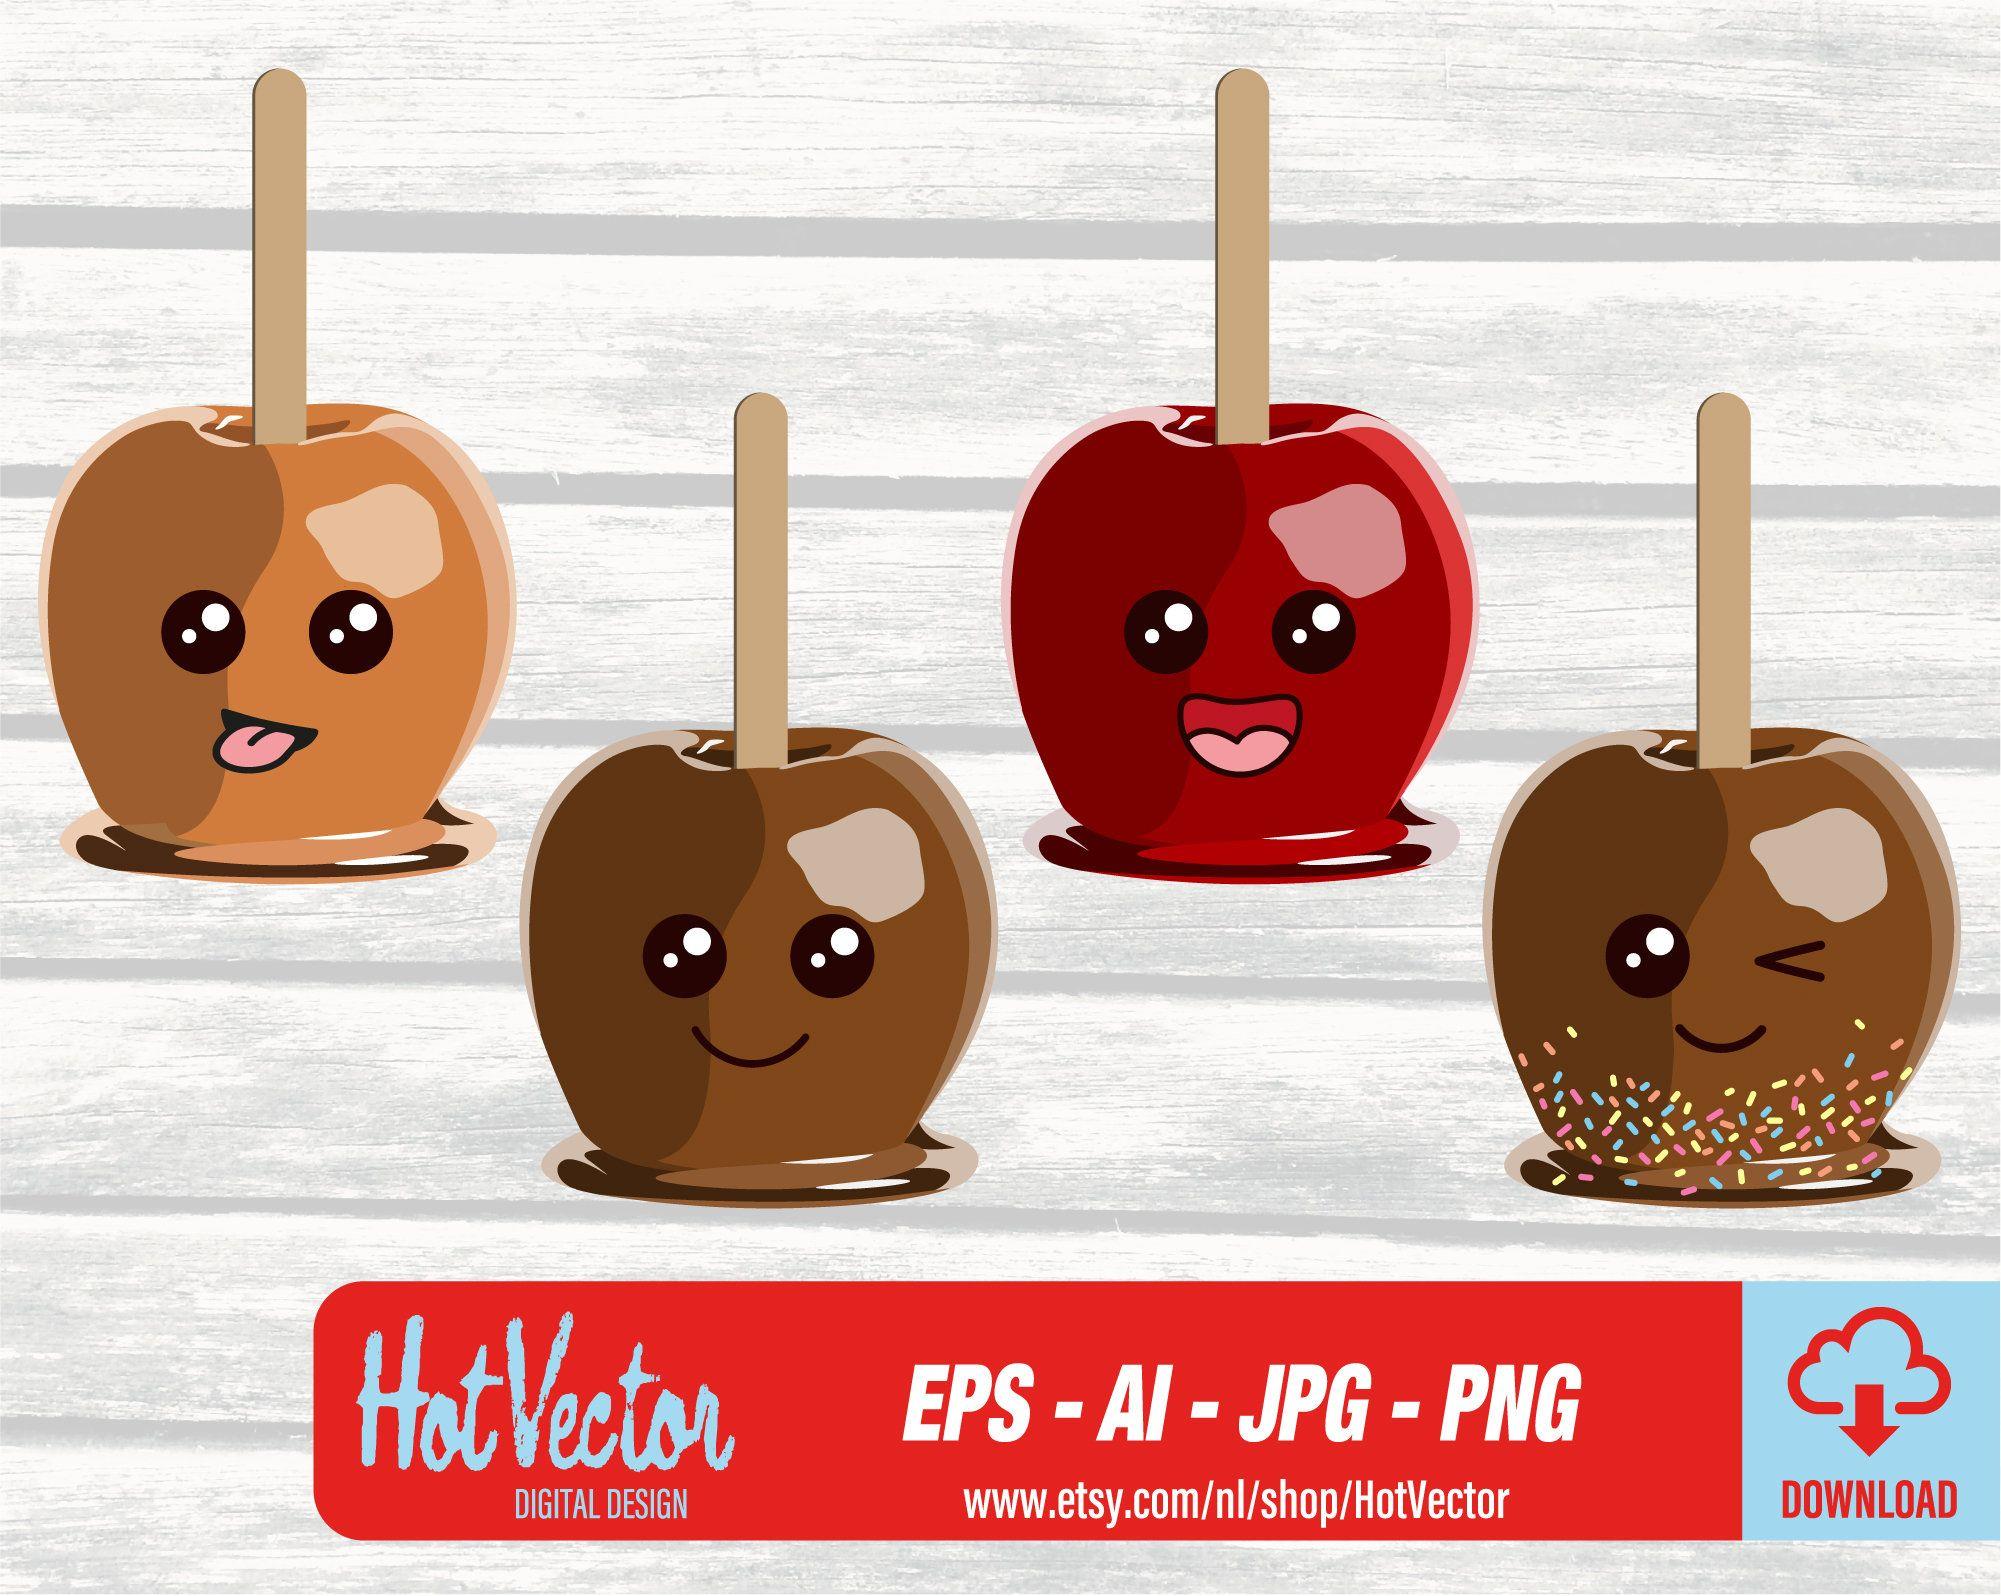 Karamel Candy Apple Emoji clipartAI, EPS, PNG, jpgDIRECT